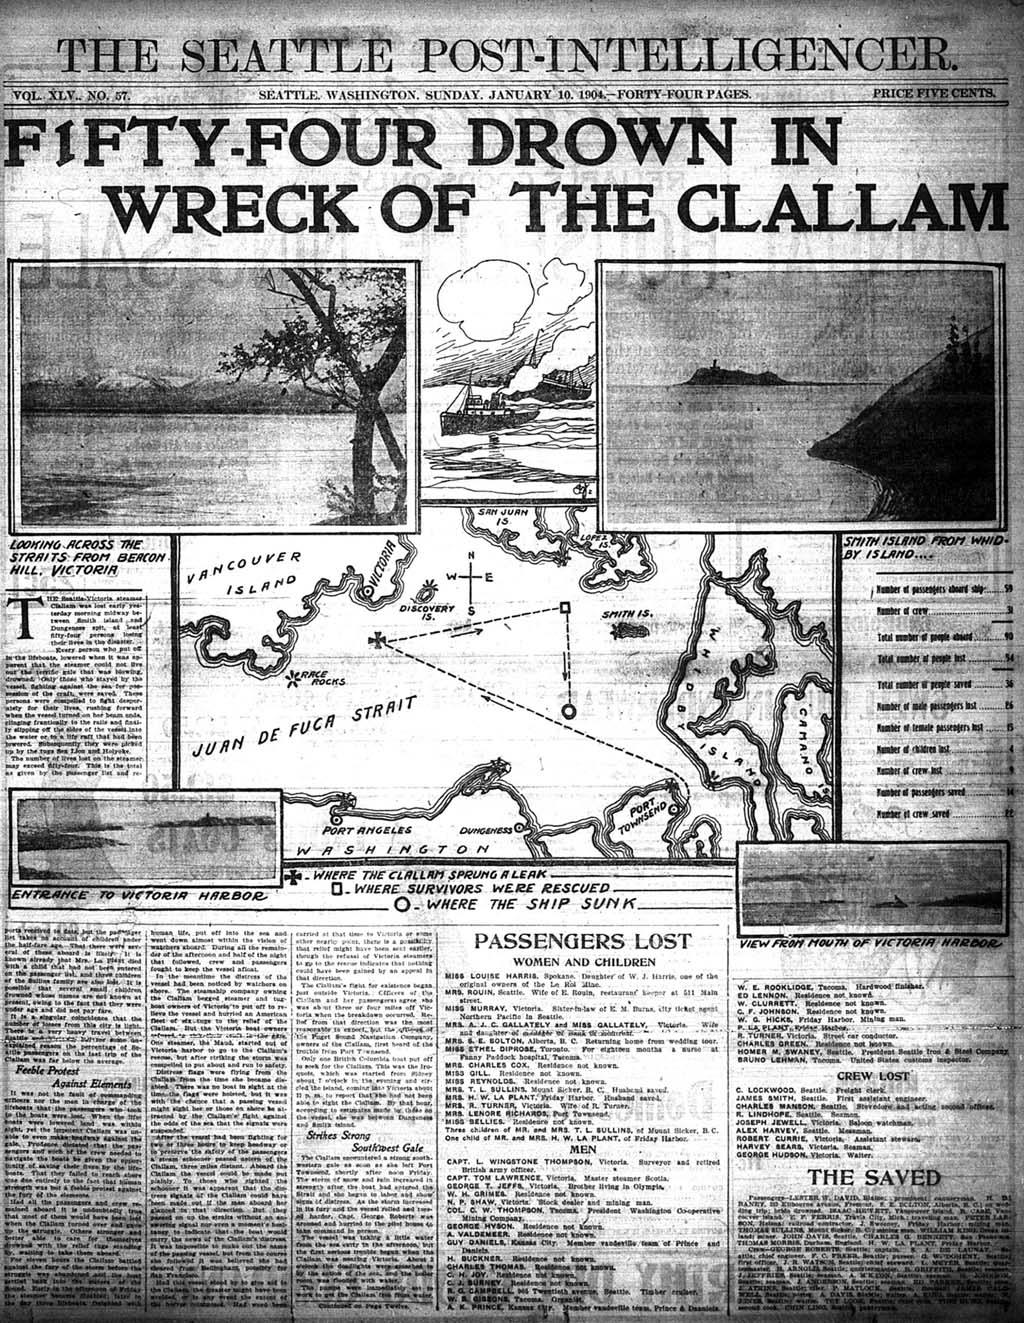 Graveyard of the Pacific: Shipwrecks on the Washington Coast